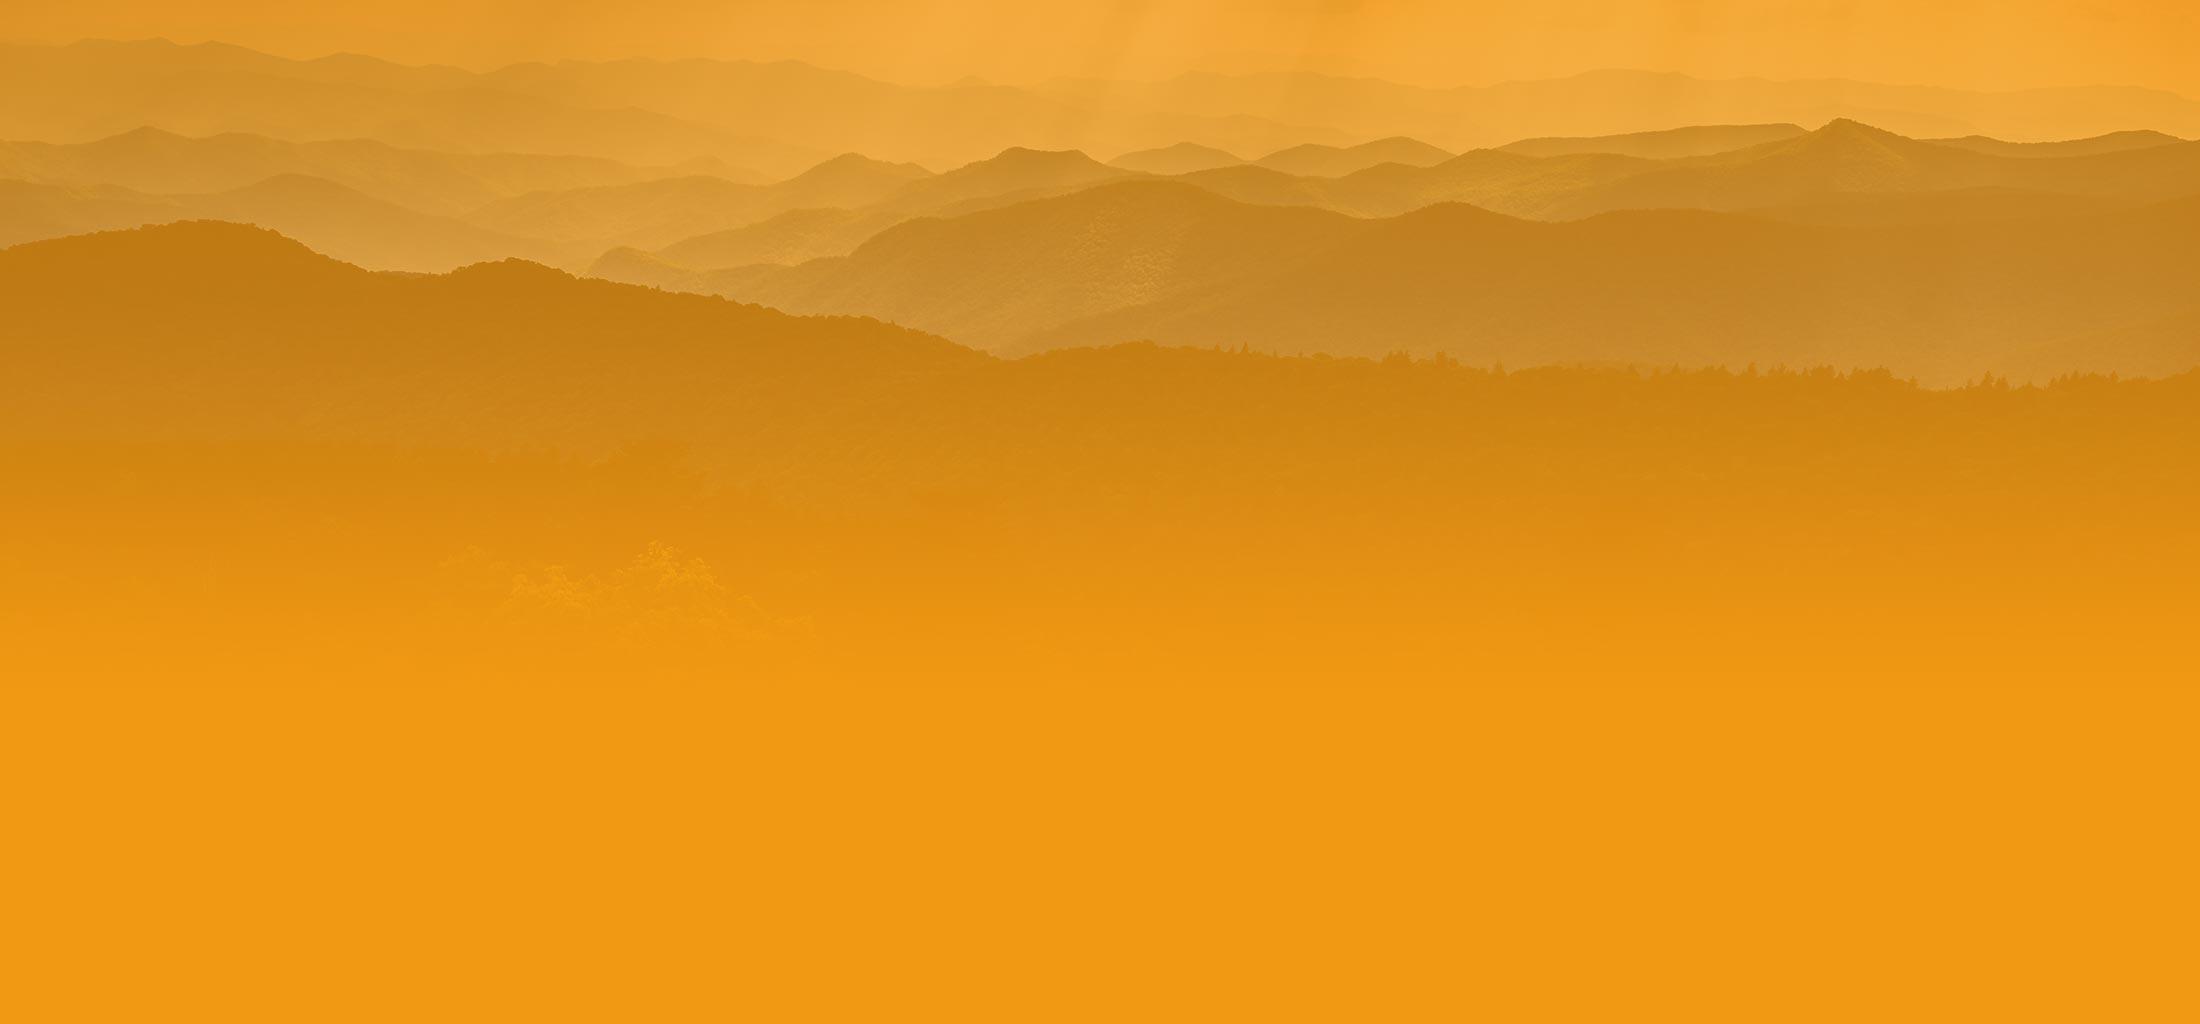 http://www.vantagep.com/wp-content/uploads/2014/08/mountains-orange-175568327.jpg